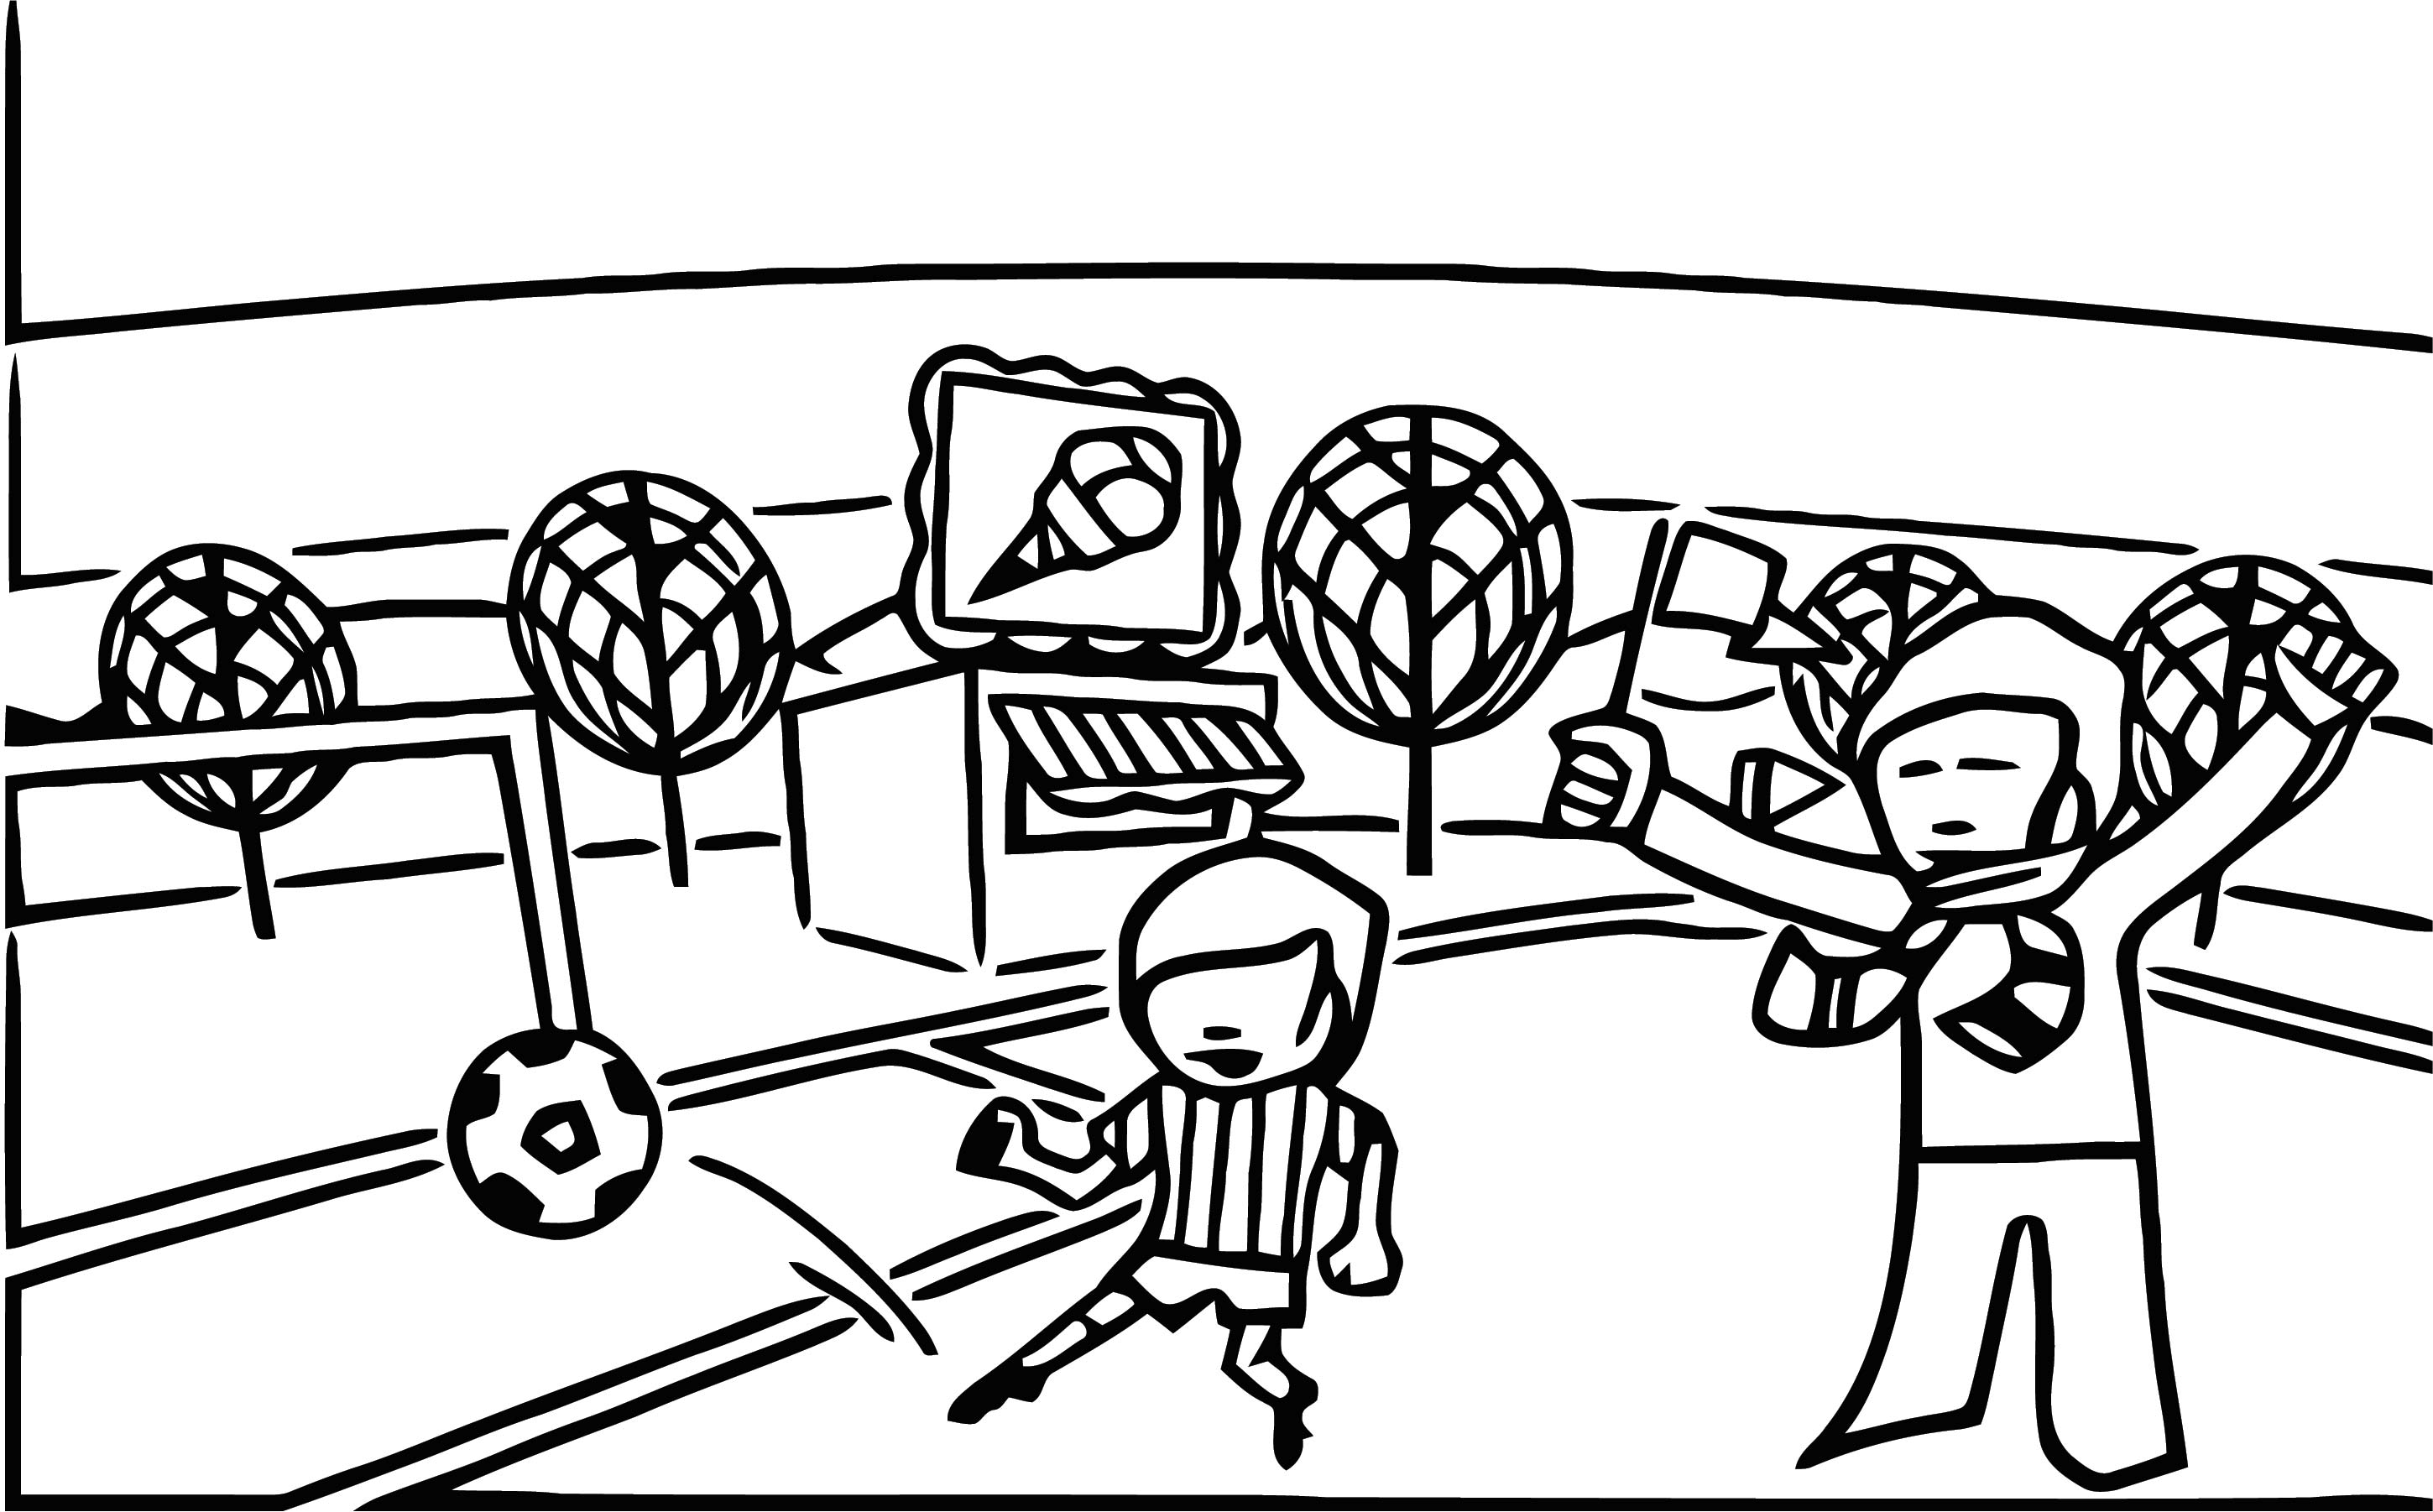 Hemglassfotb Cartoonize Coloring Page